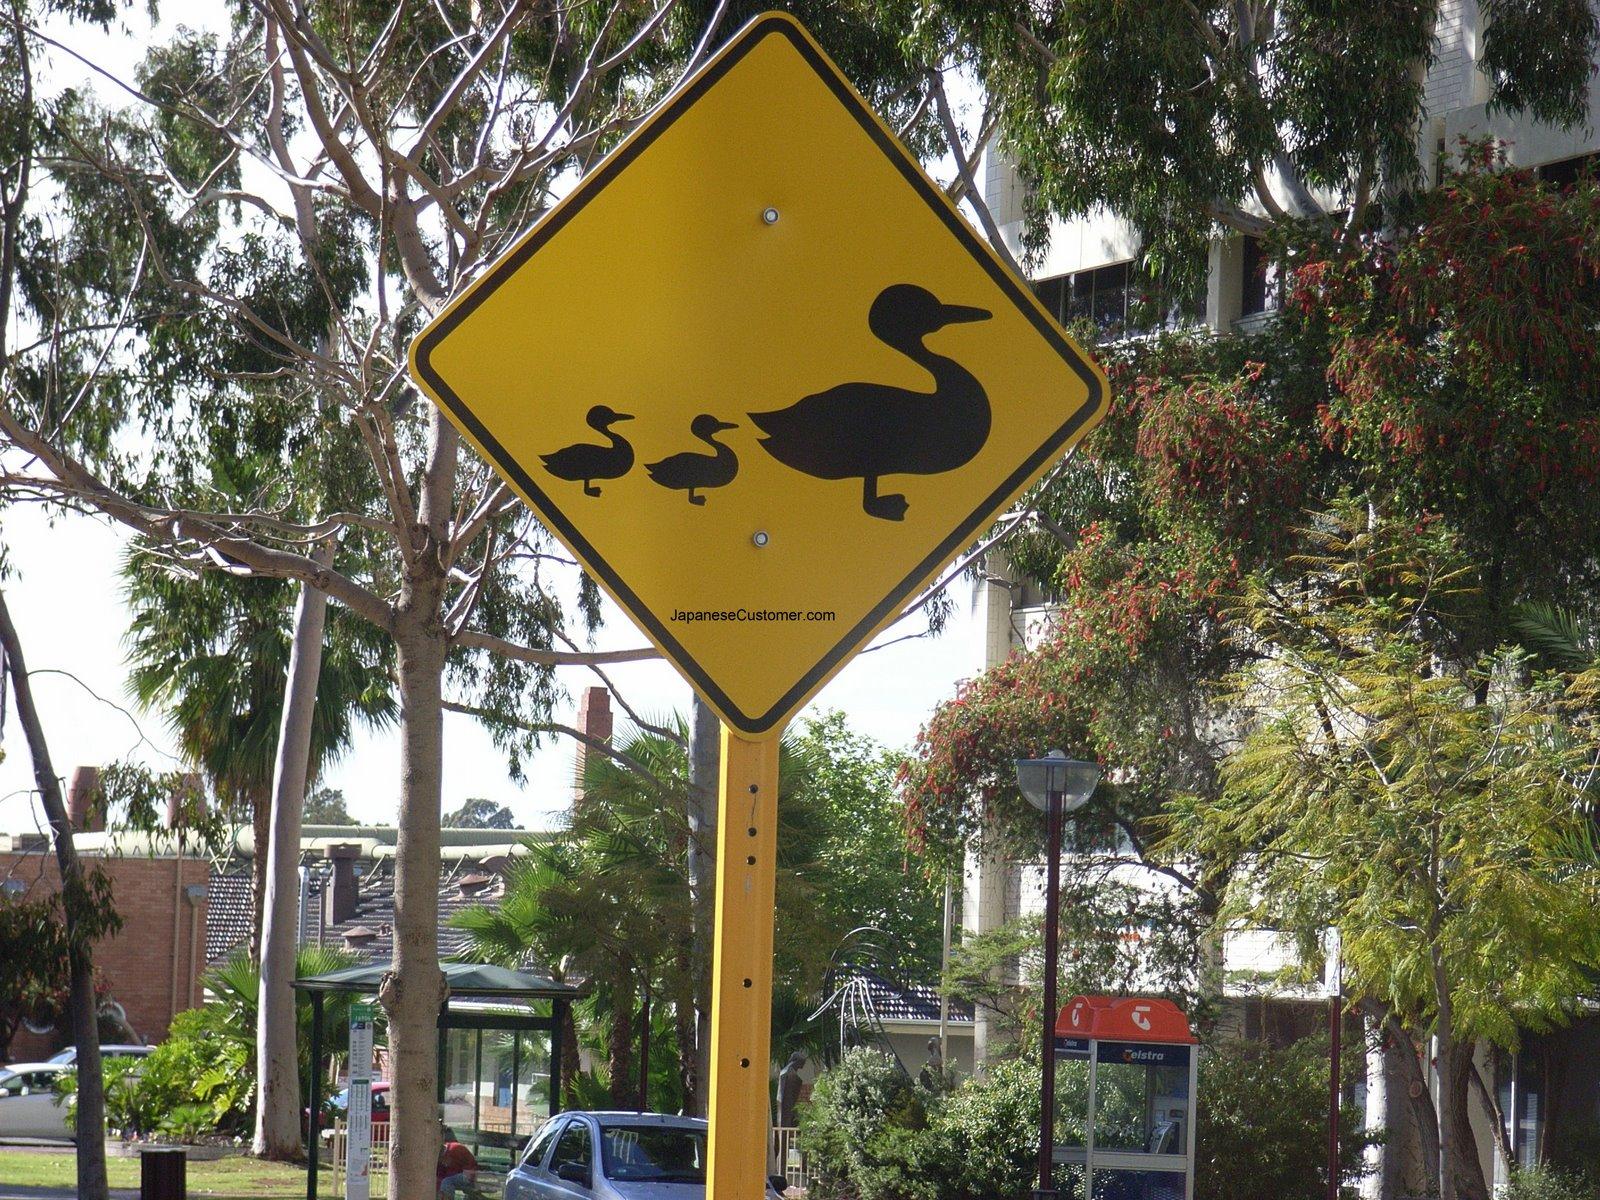 Australian street scene Copyright Peter Hanami 2007